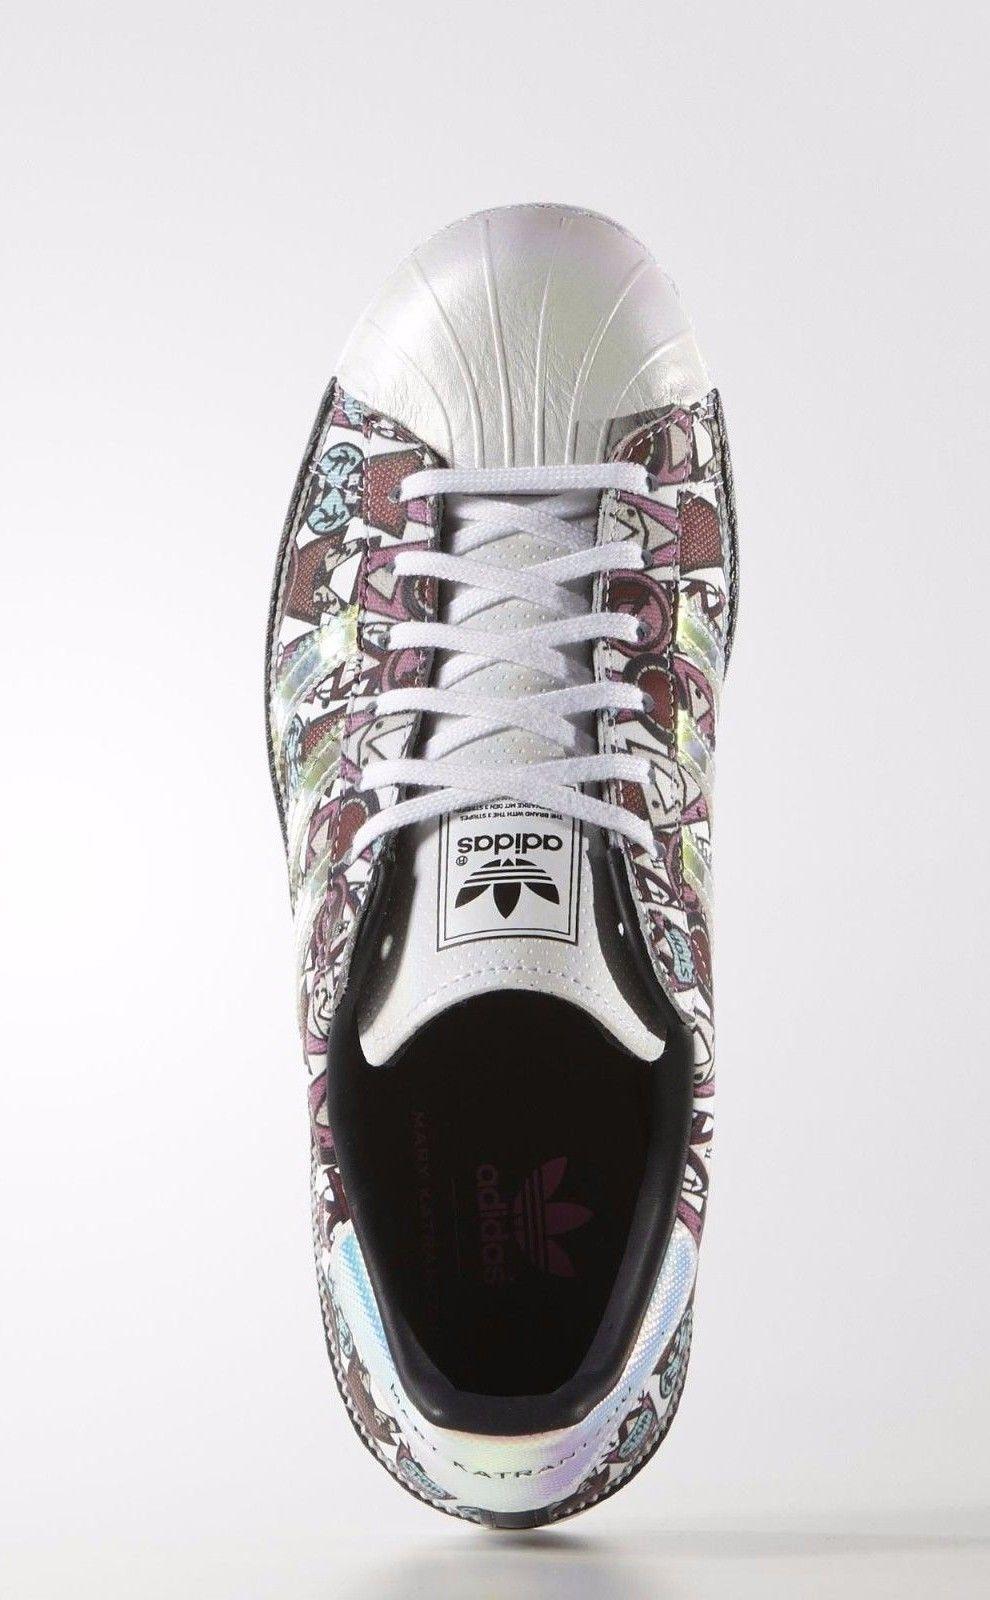 promo code 2c1bd a26c6 2016 Adidas Originals Superstar 80s Mary Katrantzou mujer Zapatos AF5272 De  venta